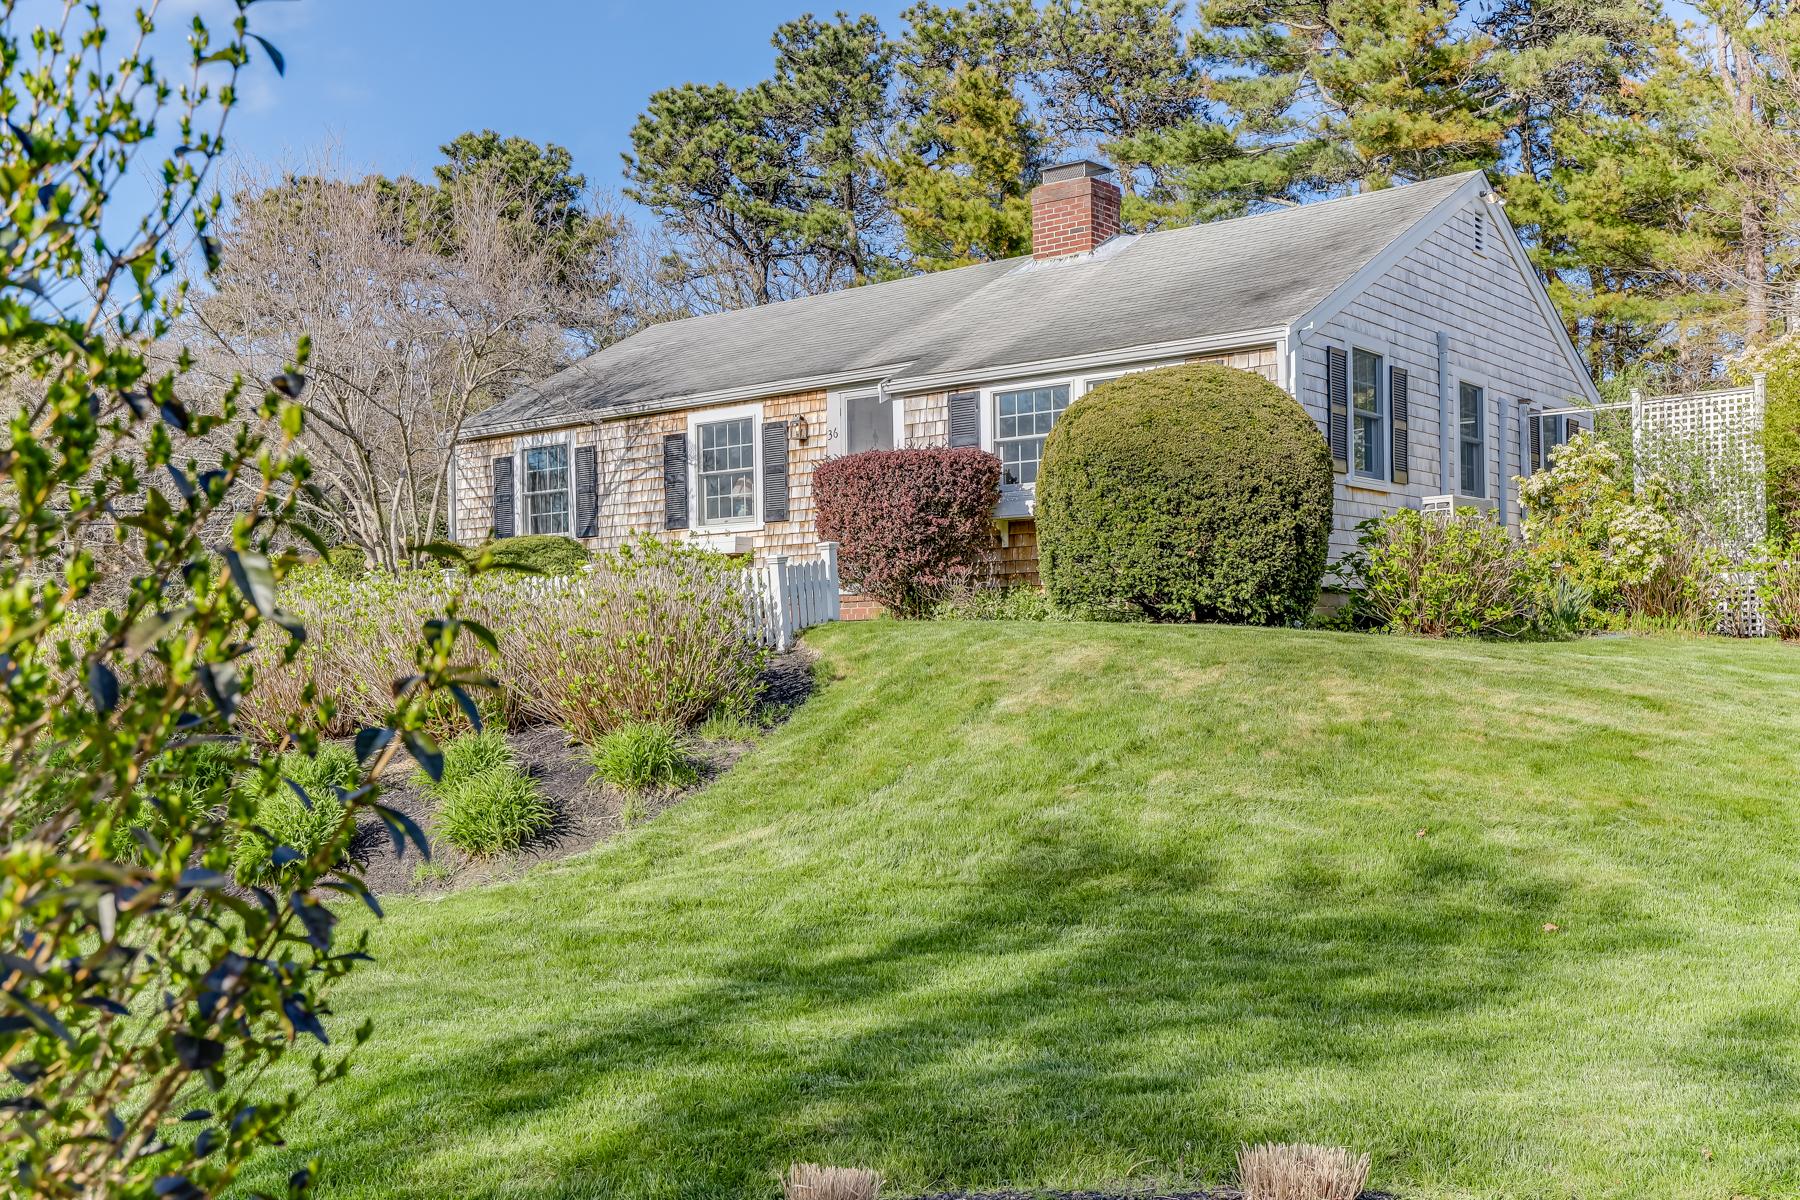 Single Family Homes için Satış at 36 Kendrick Road, North Chatham North Chatham, Massachusetts 02650 Amerika Birleşik Devletleri